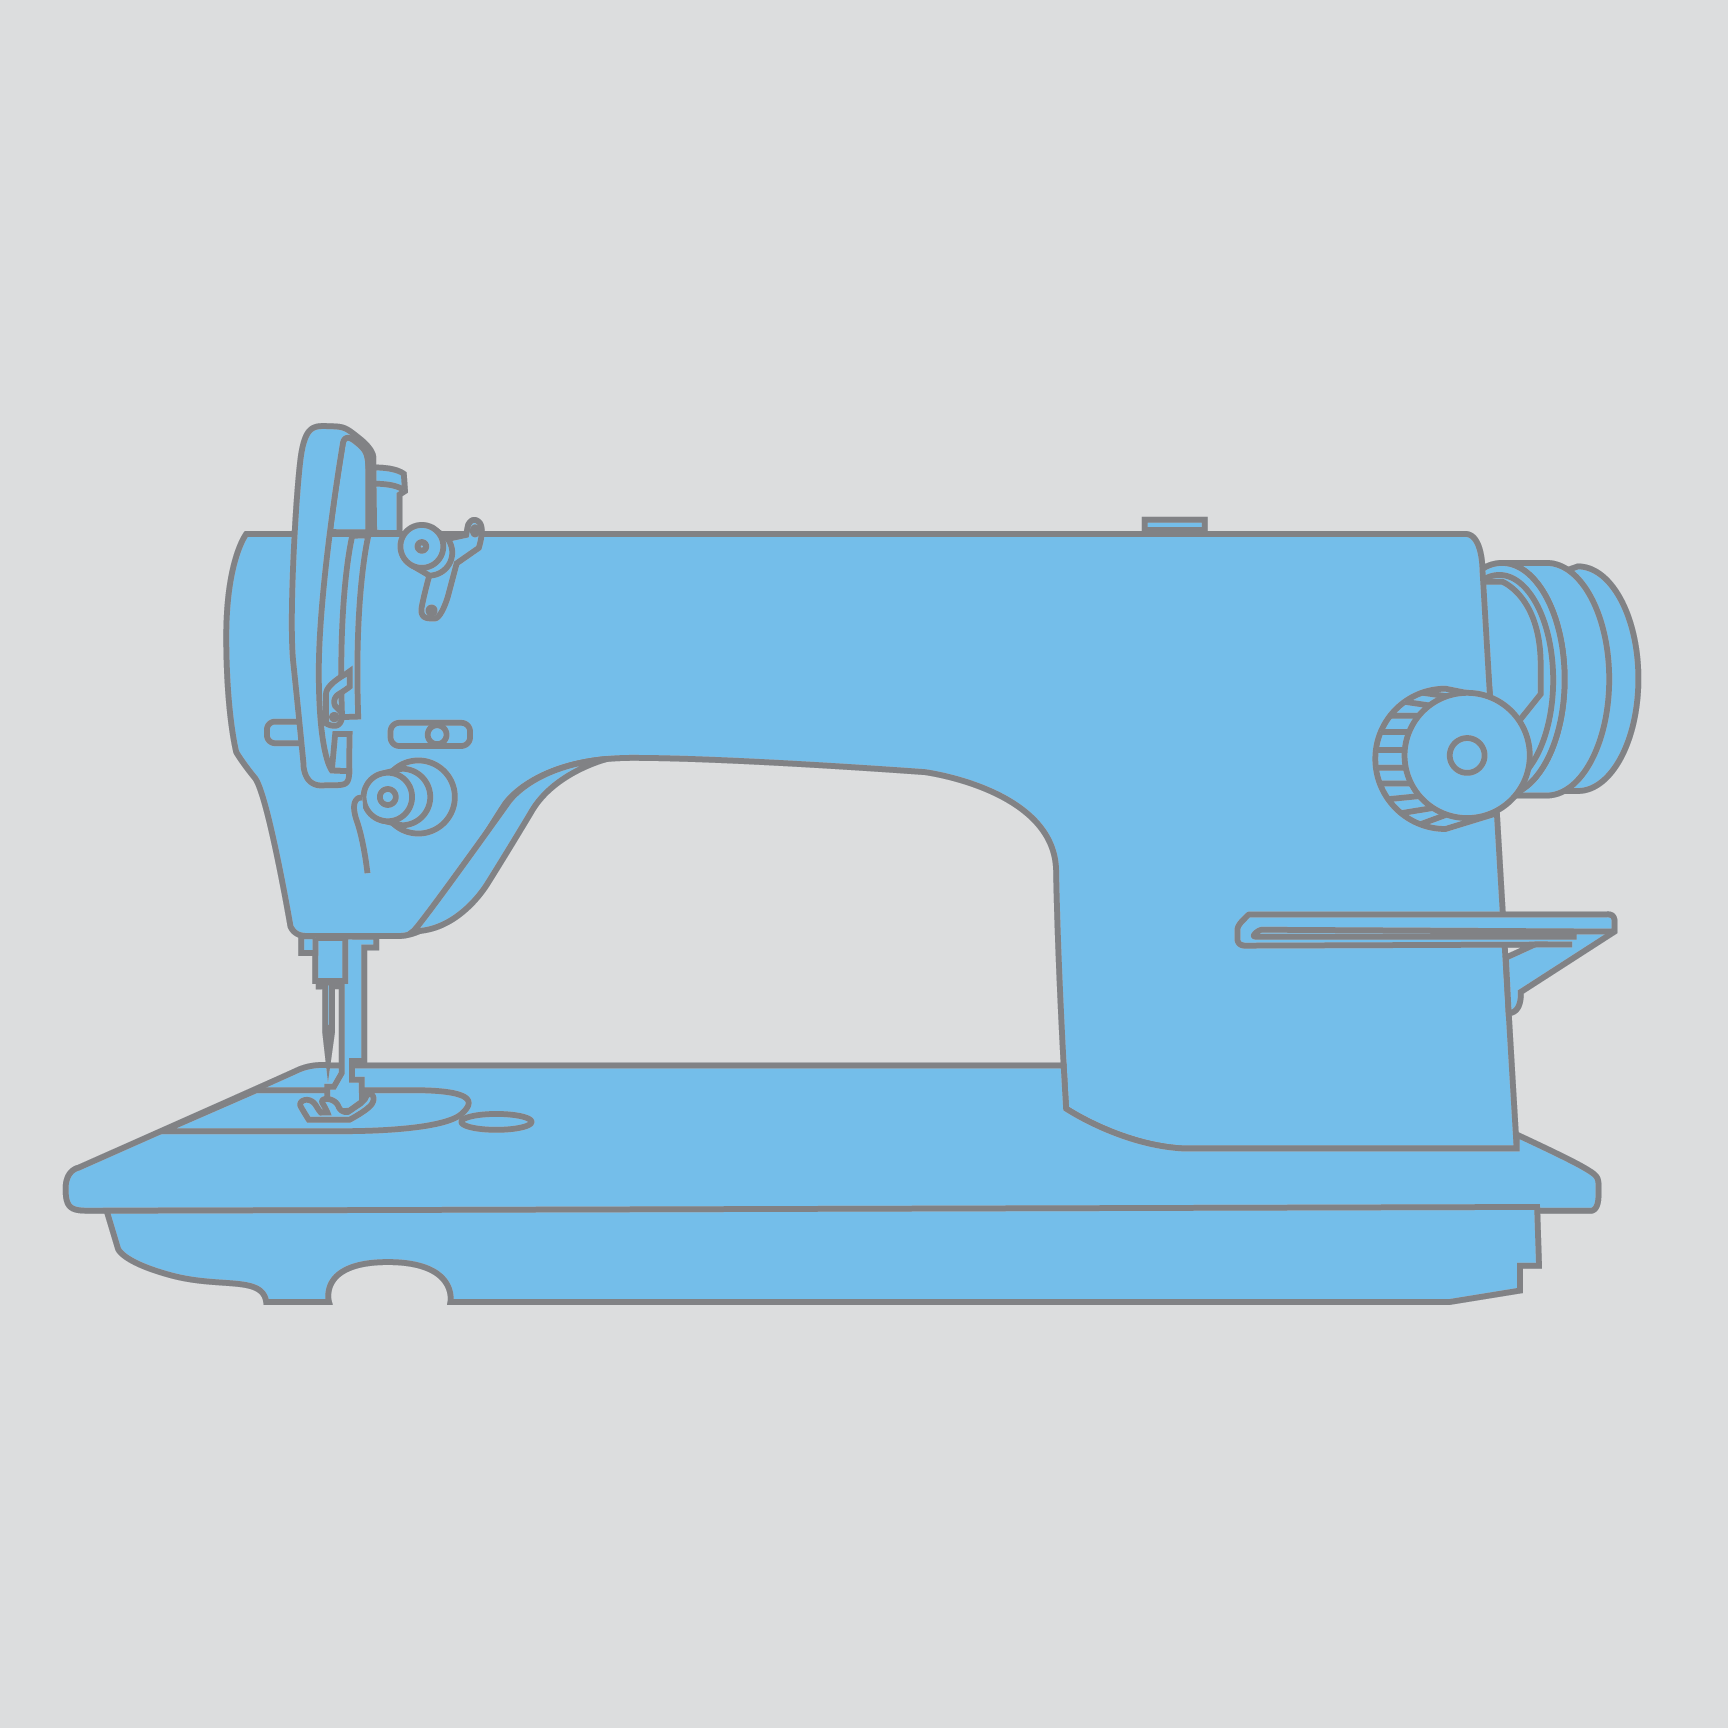 Class_Illustrations_Medium_Blue_Gray_BG_Artboard 2_4x.png